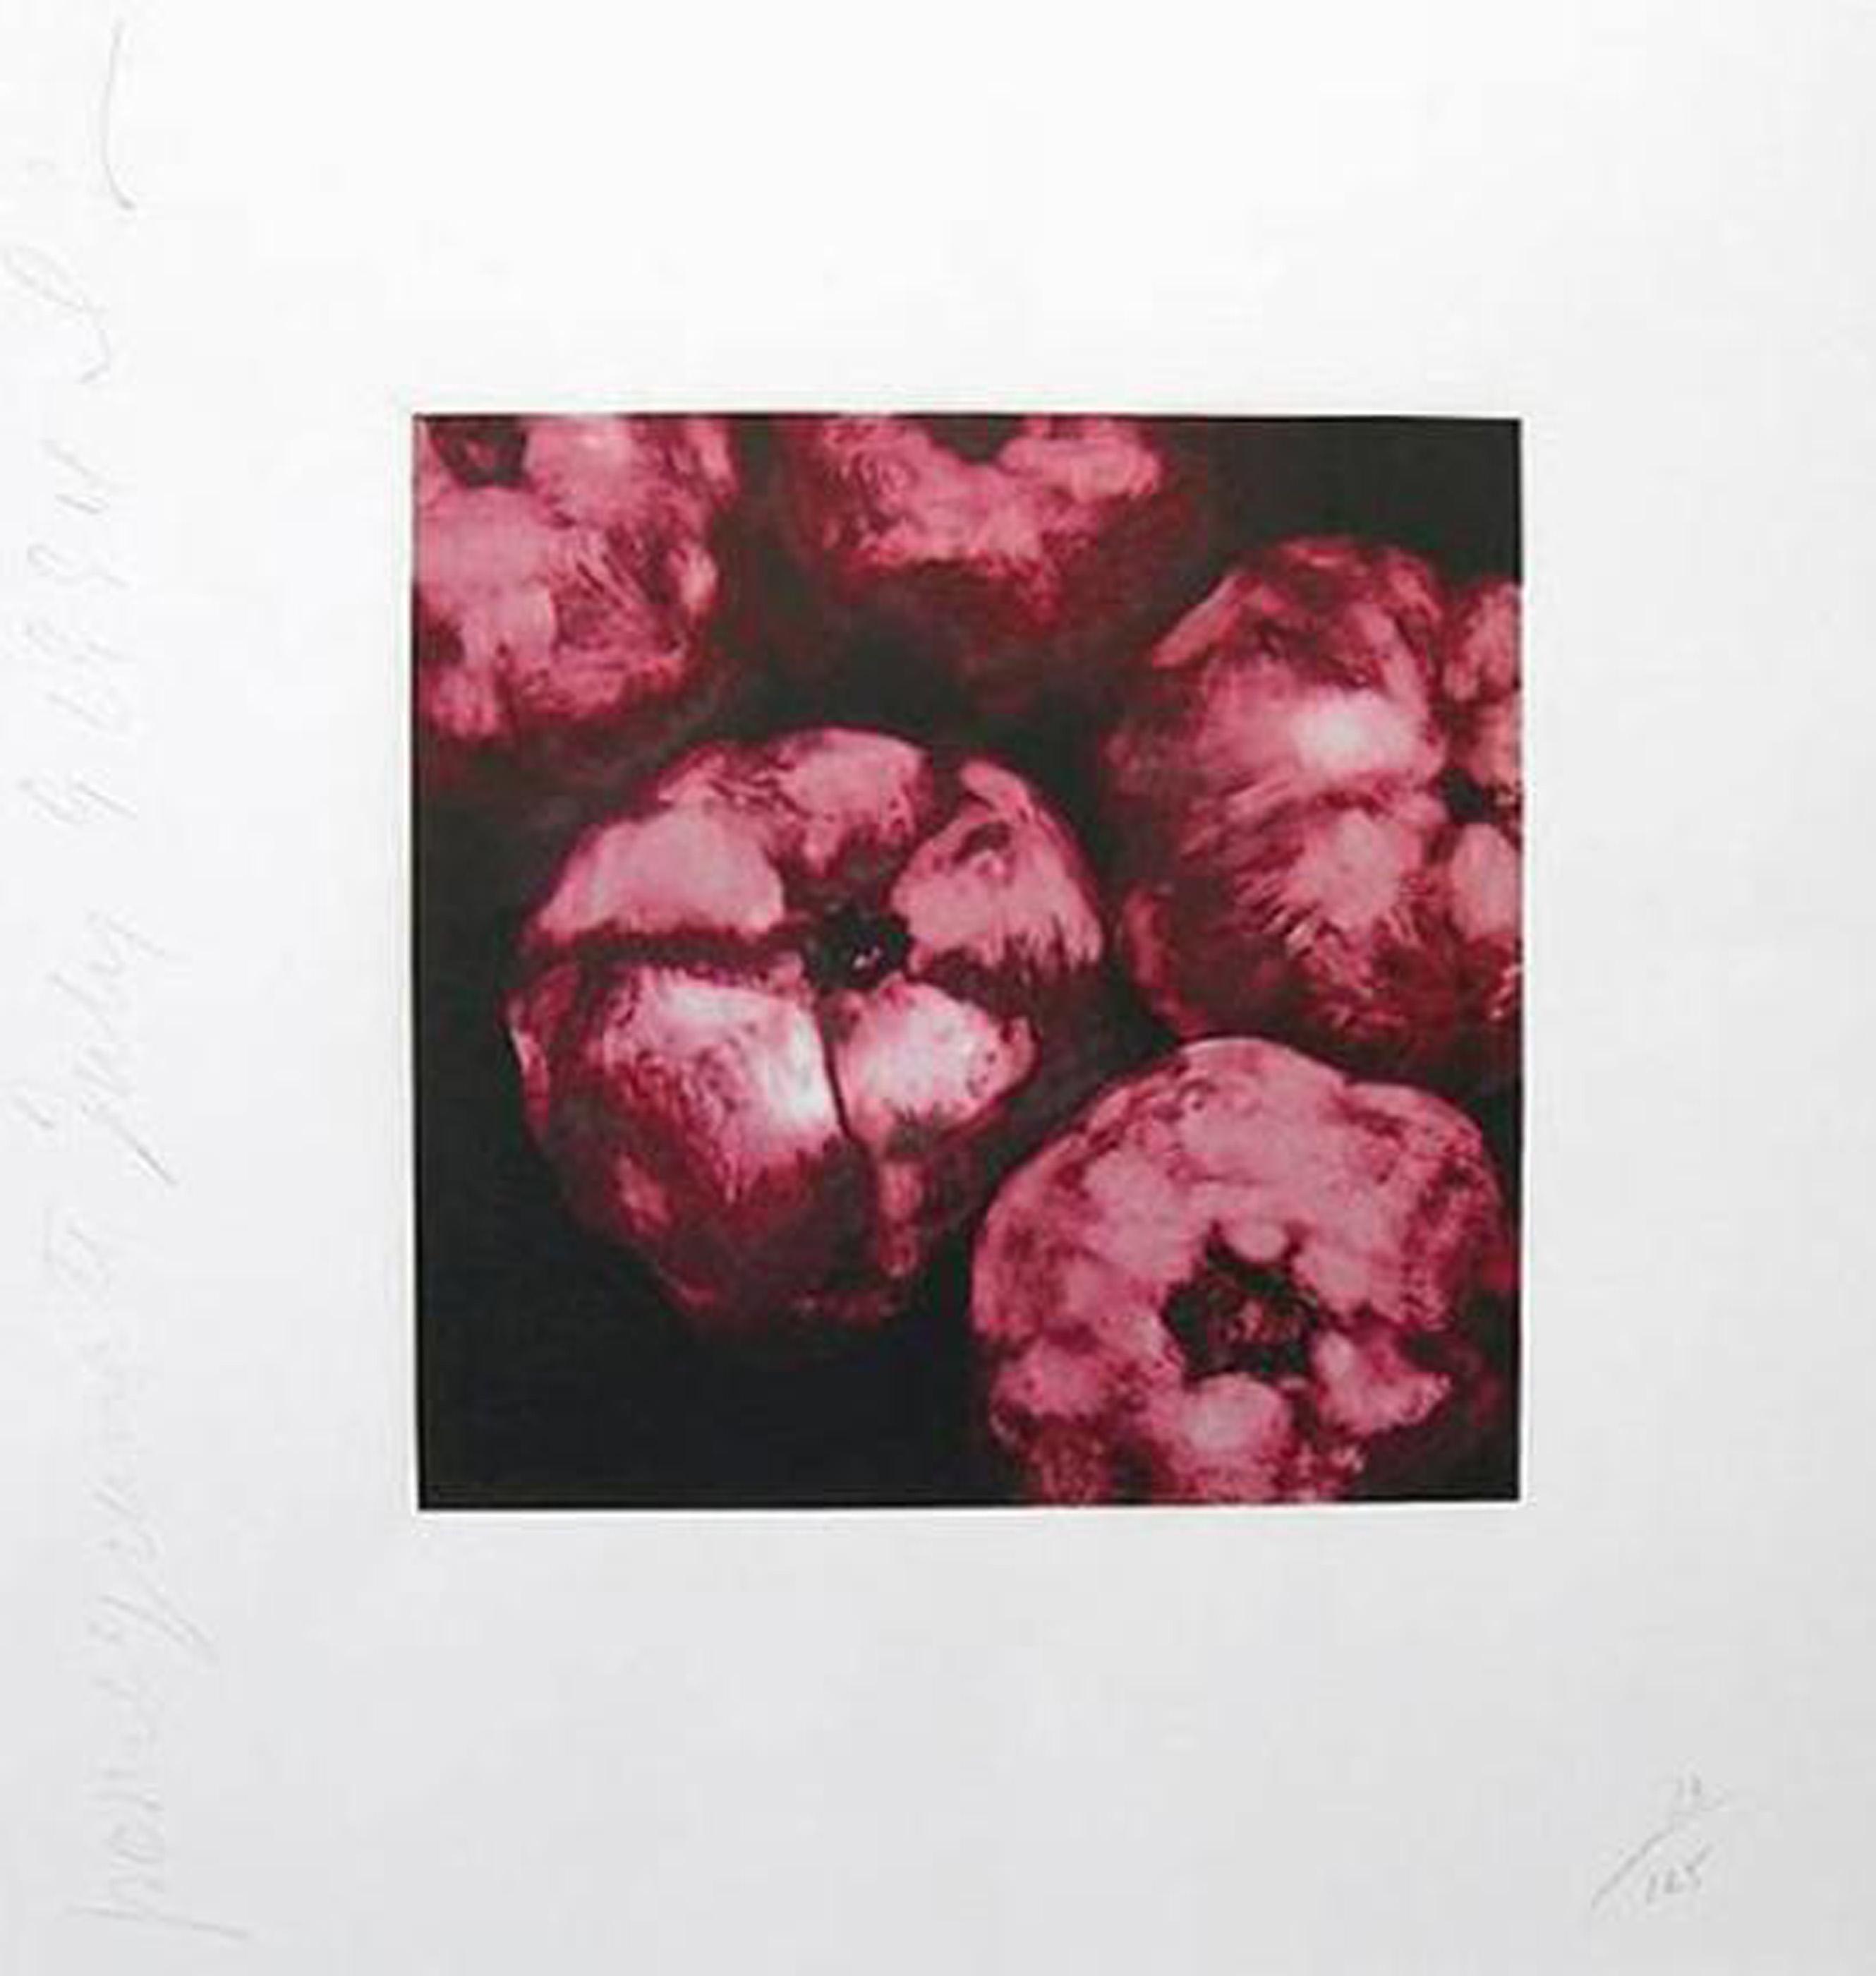 Donald Sultan, Pomegranates, Silkscreen